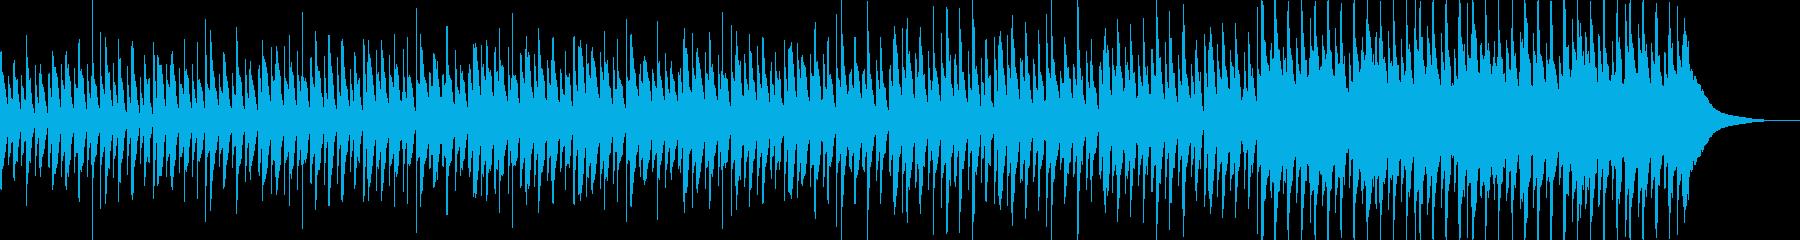 CM、ハッピーでかわいいアコースティックの再生済みの波形